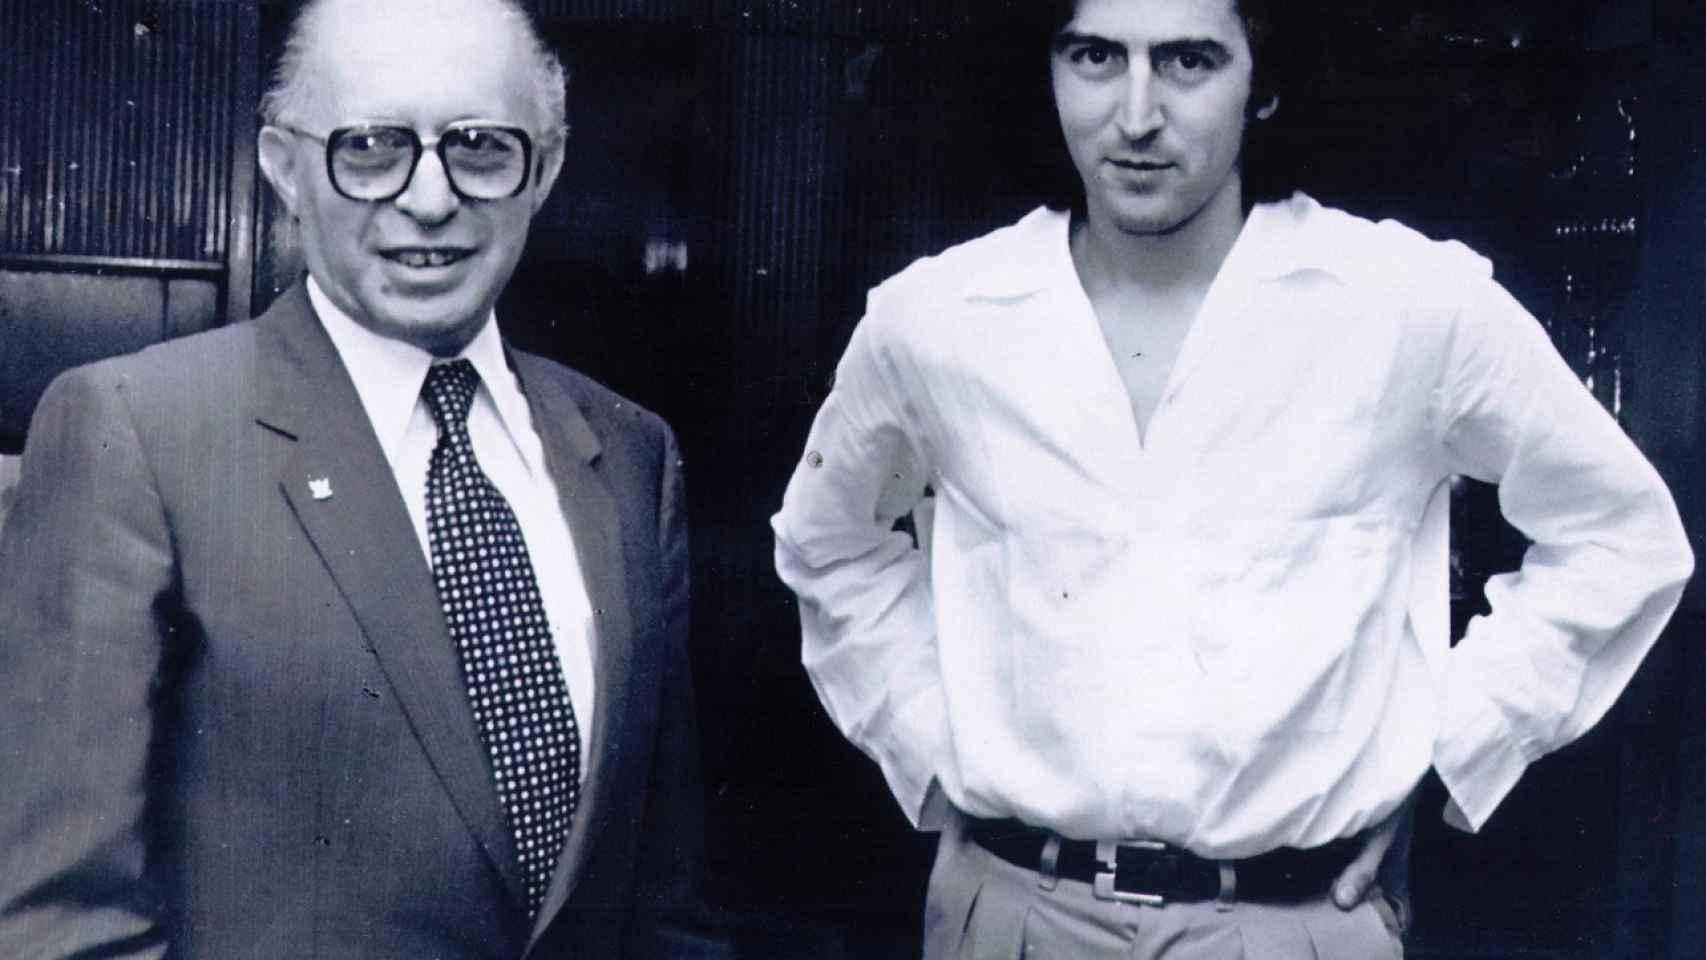 Bernard-Henri Lévy junto al exprimer ministro de Israel Menahem Begin en Jerusalén en 1979.